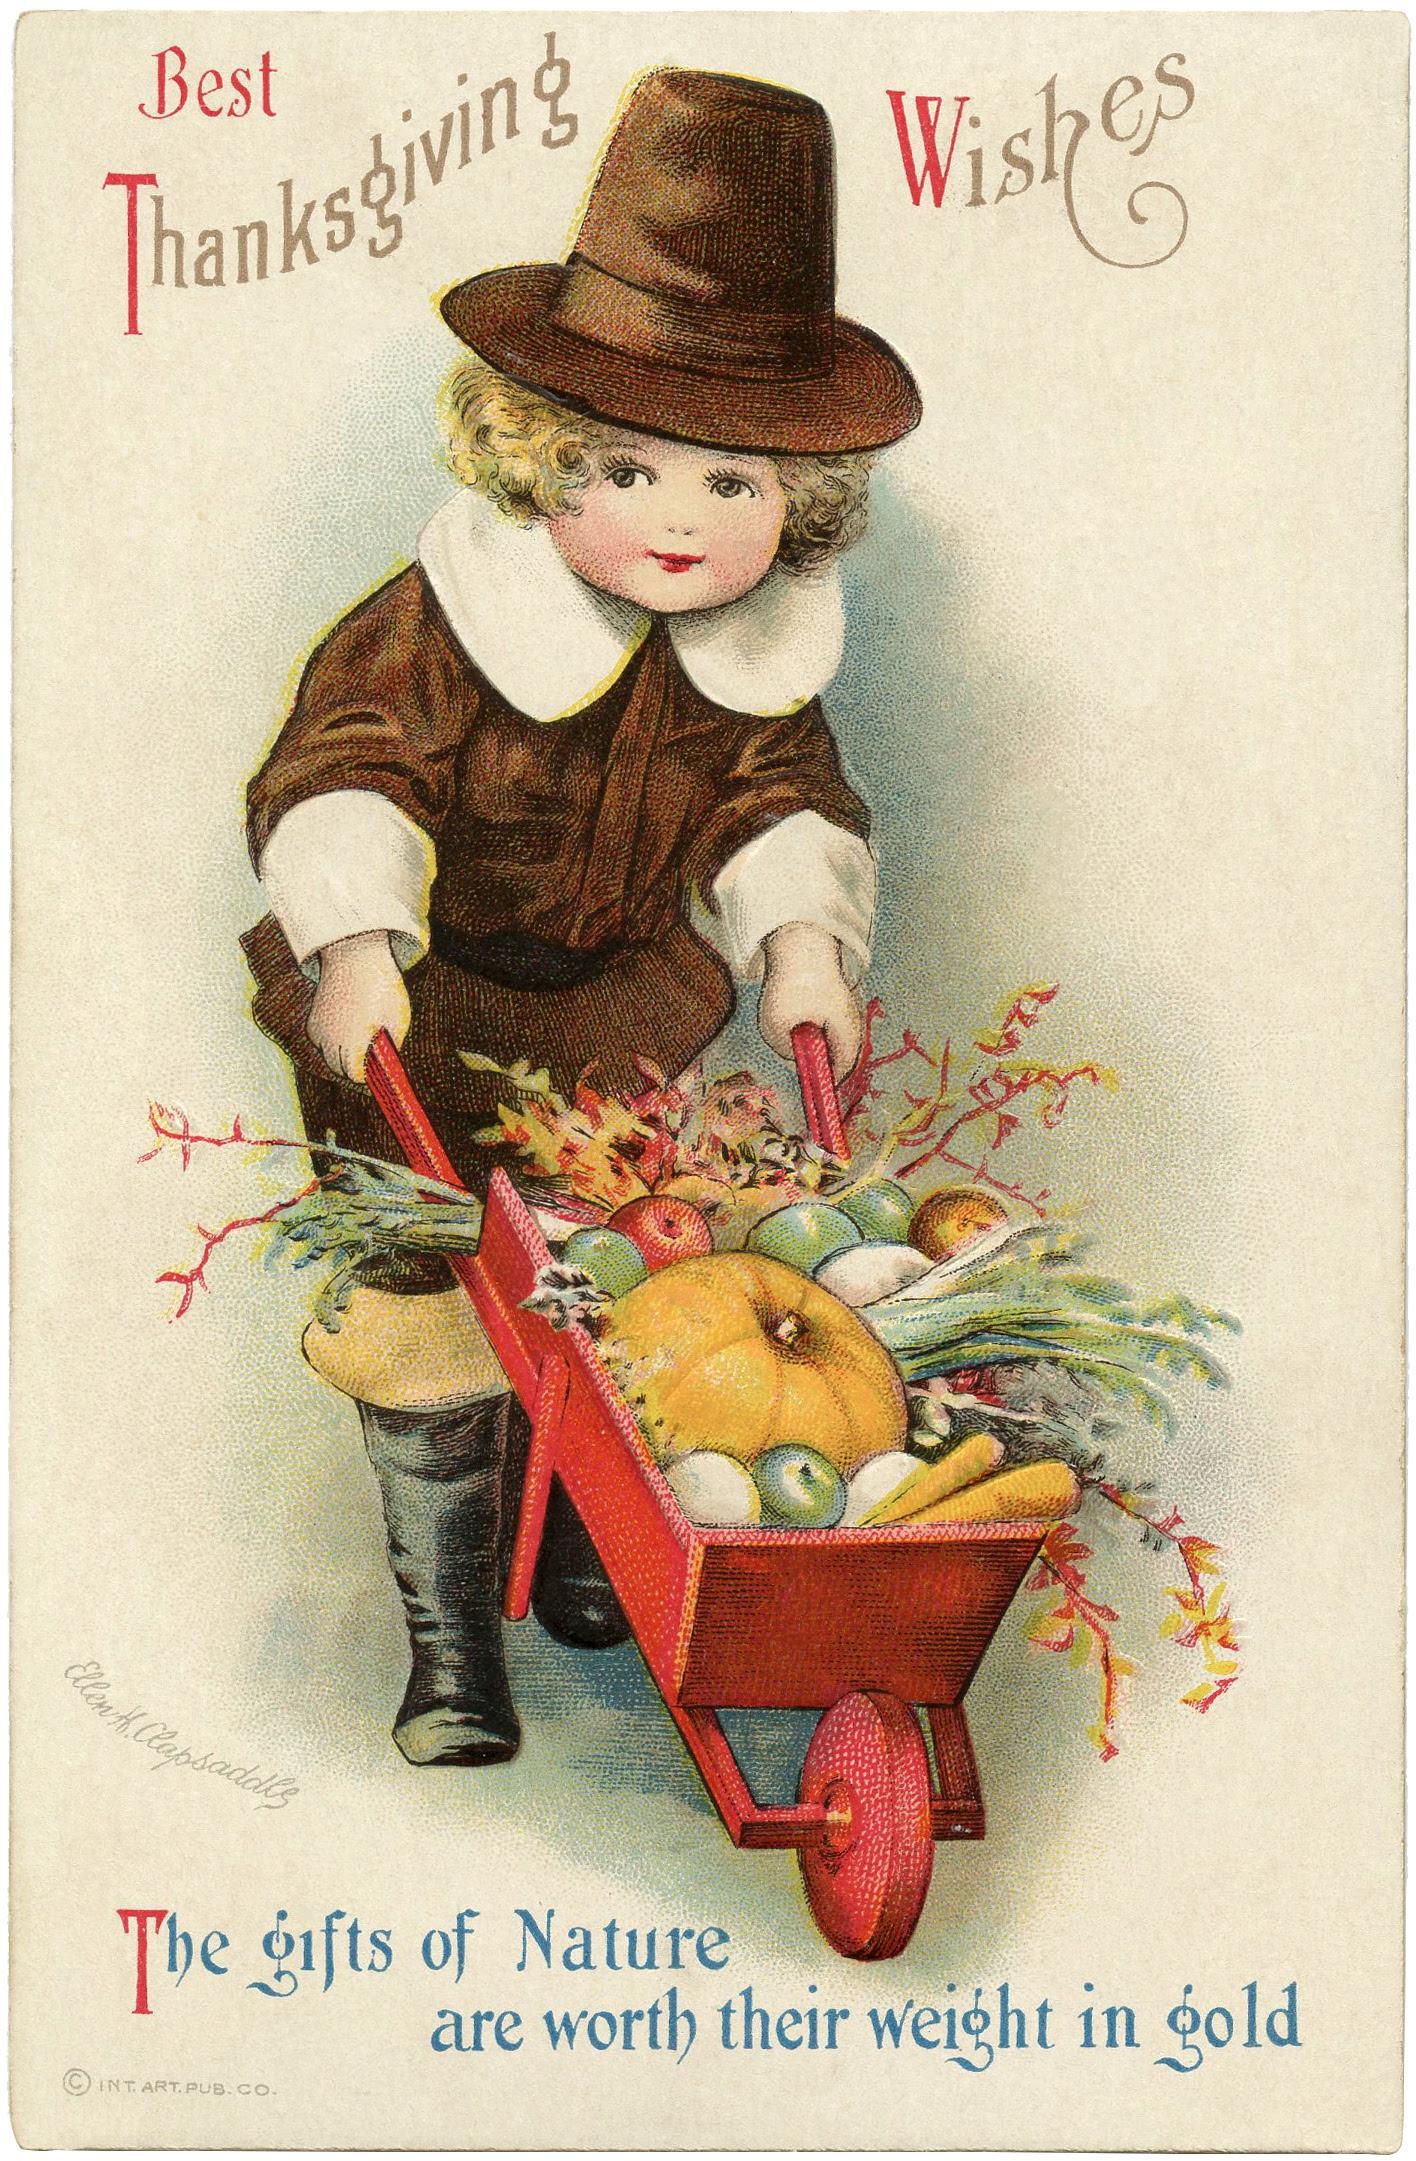 http://thegraphicsfairy.com/wp-content/uploads/2013/10/Vintage-Pilgrim-Boy-Image-GraphicsFairy.jpg